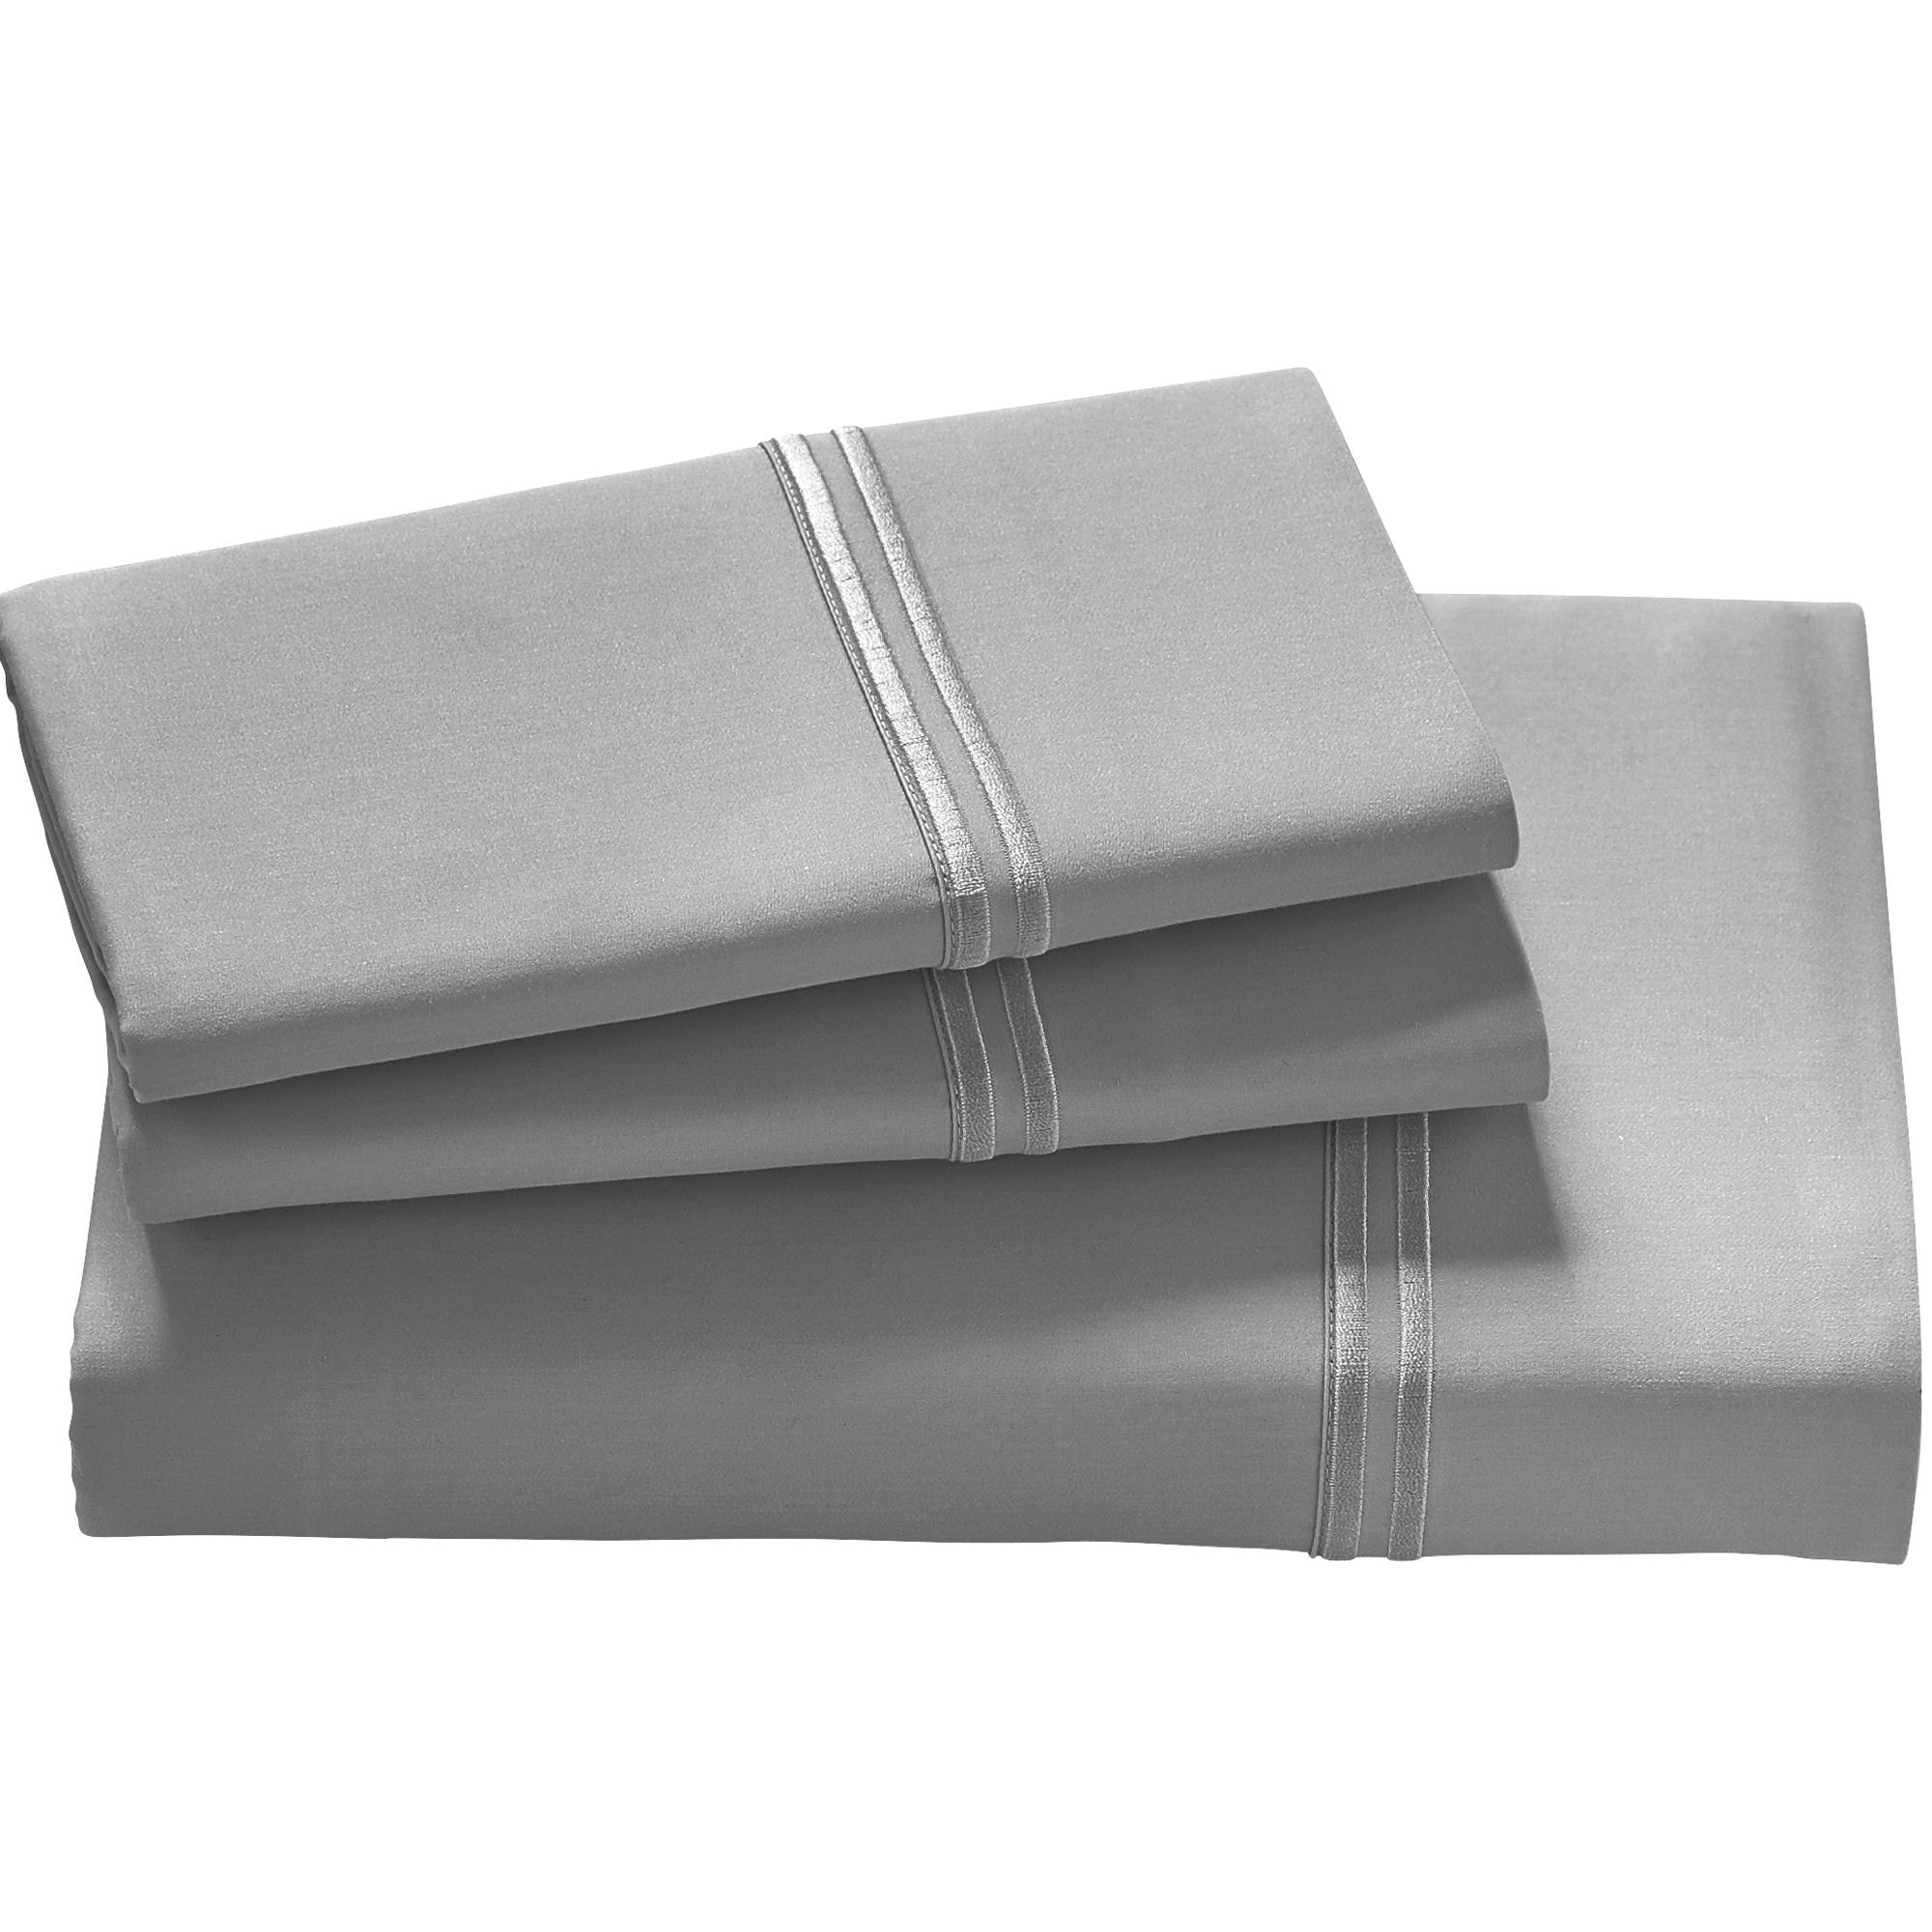 Purecare | Elements Dove Gray Split California King Tencel Sheet Set